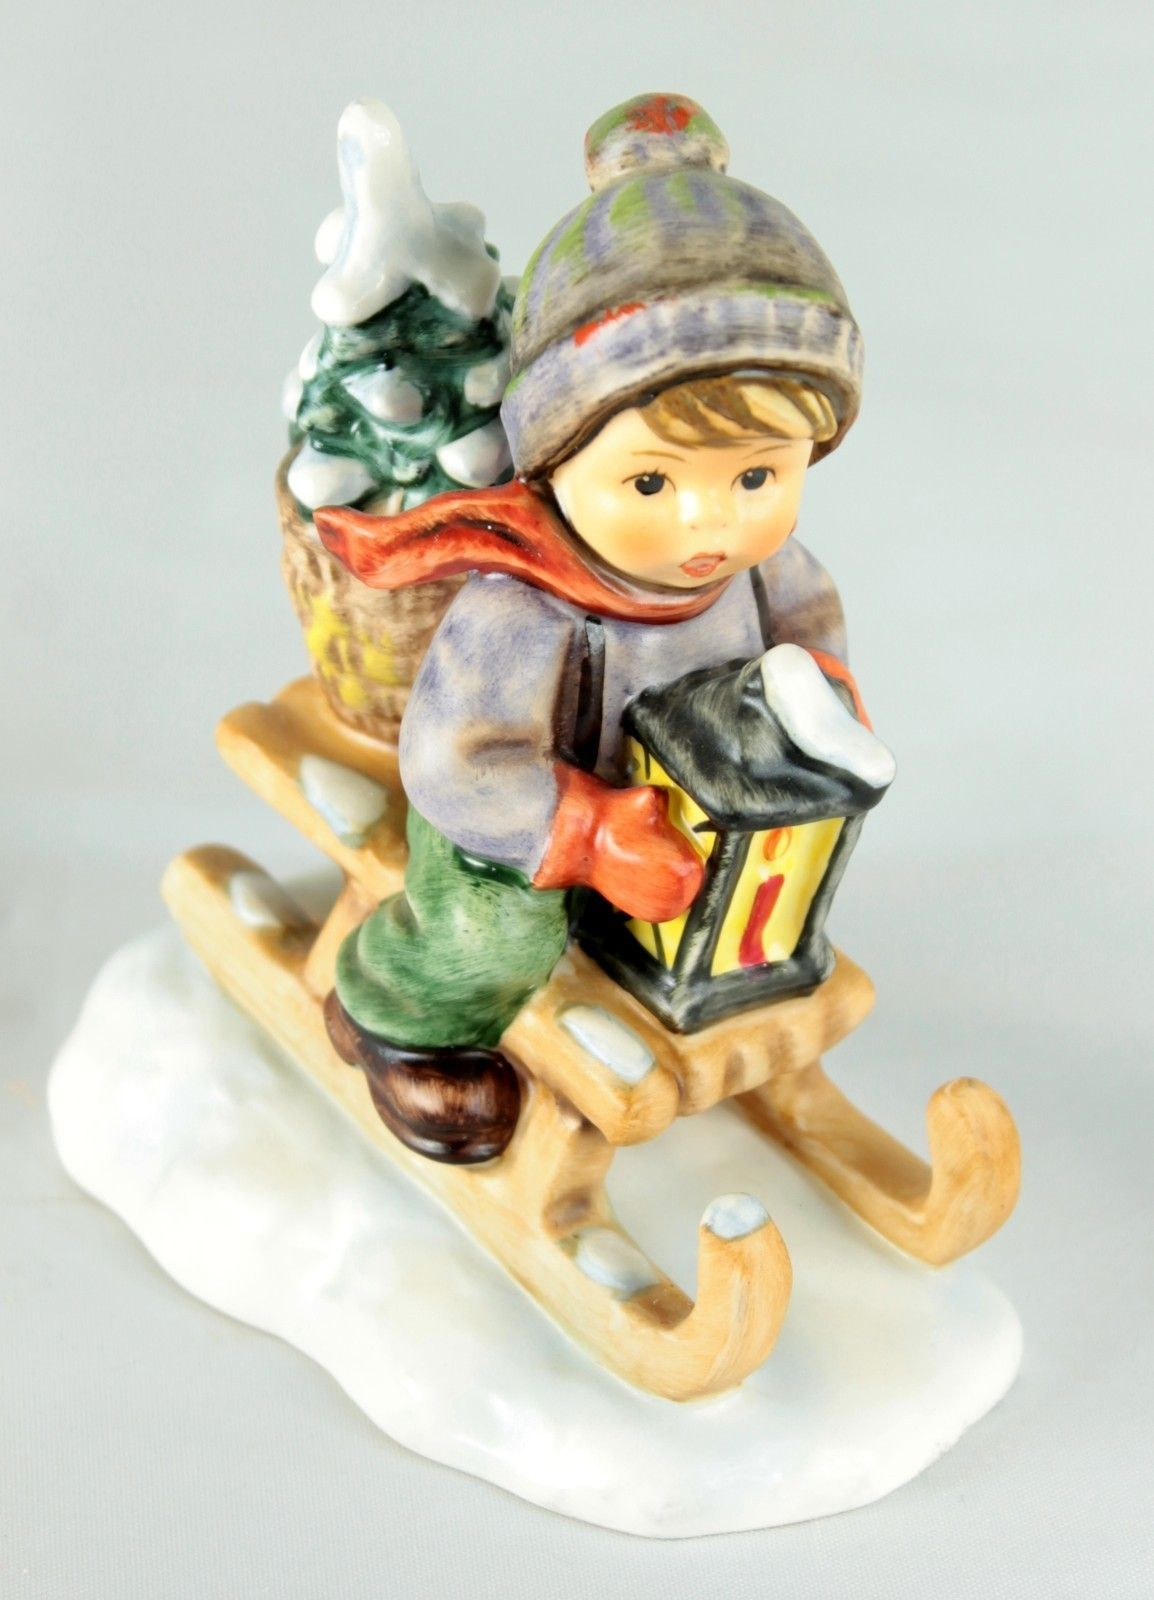 Hummel christmas tree ornaments - Goebel Hummel 396 2 0 Ride Into Christmas Boy On Sled Tree 4 25 Tmk